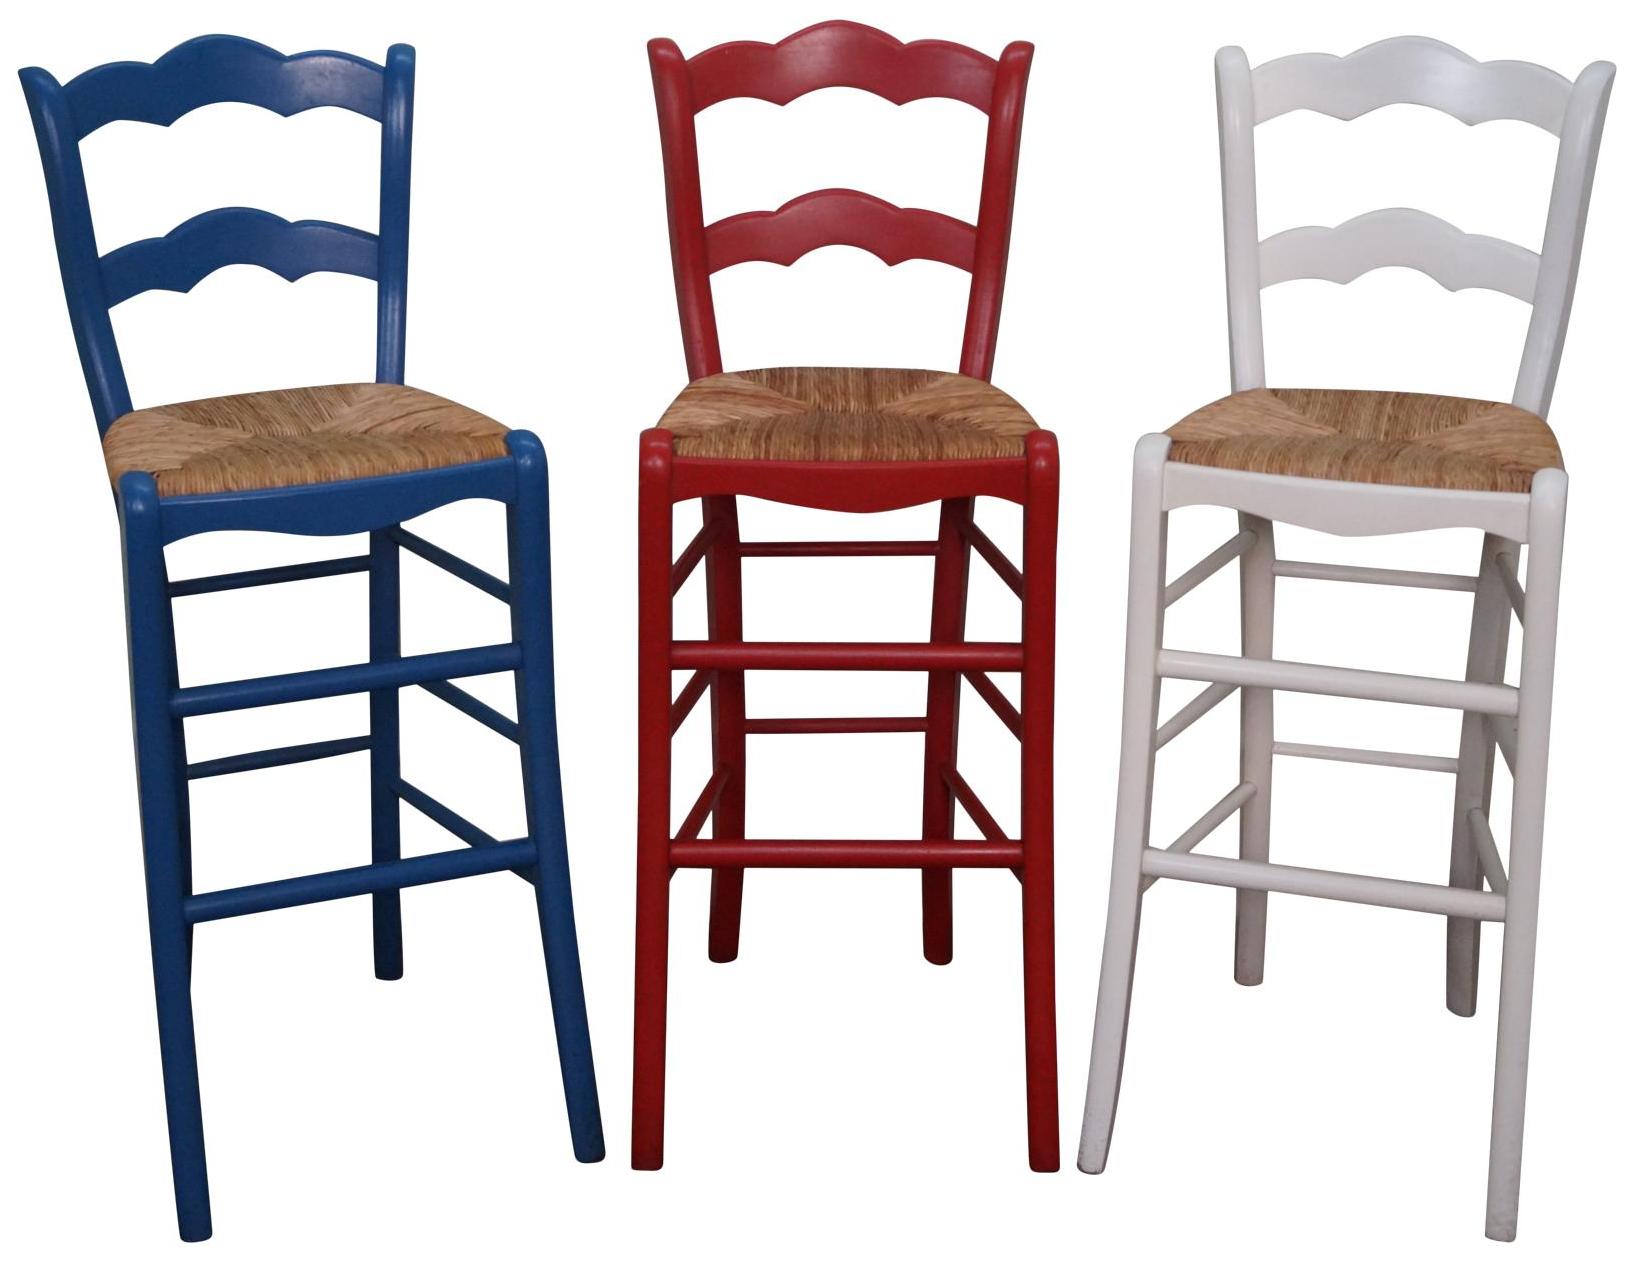 French Country Rush Seat Bar Stools Set Of 3 Chairish